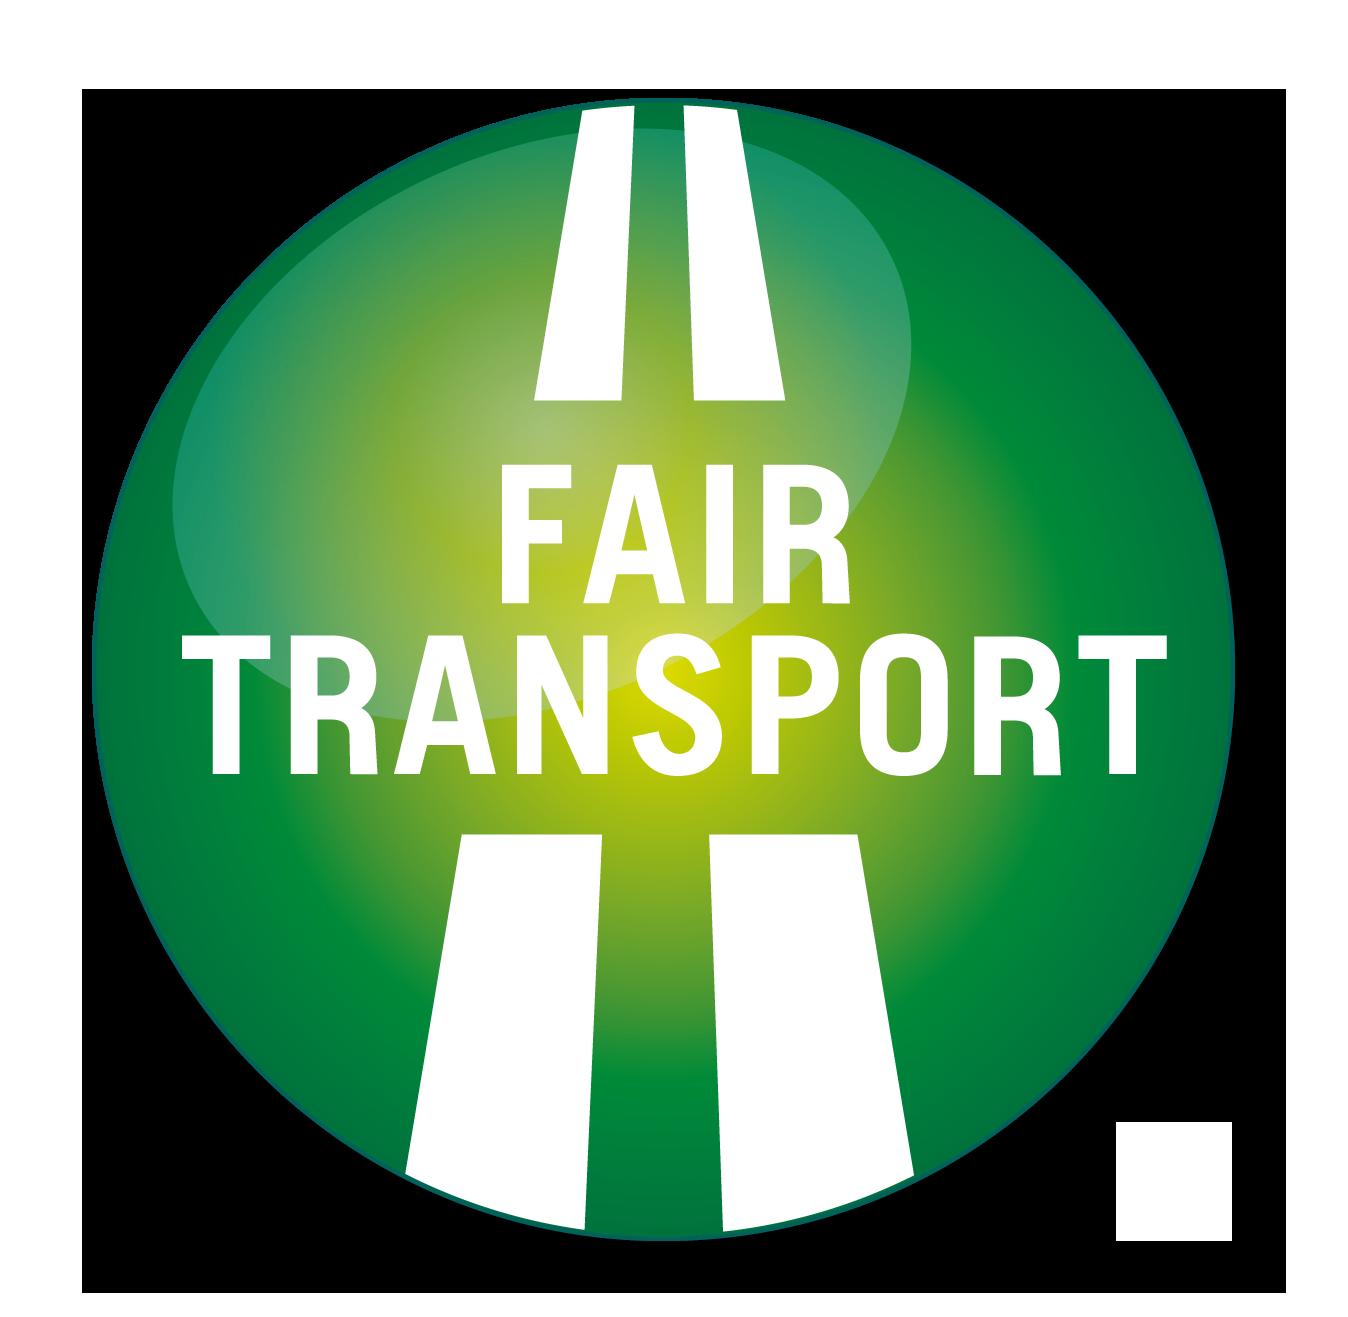 DK Transport Samarbetspartner Fairtransport